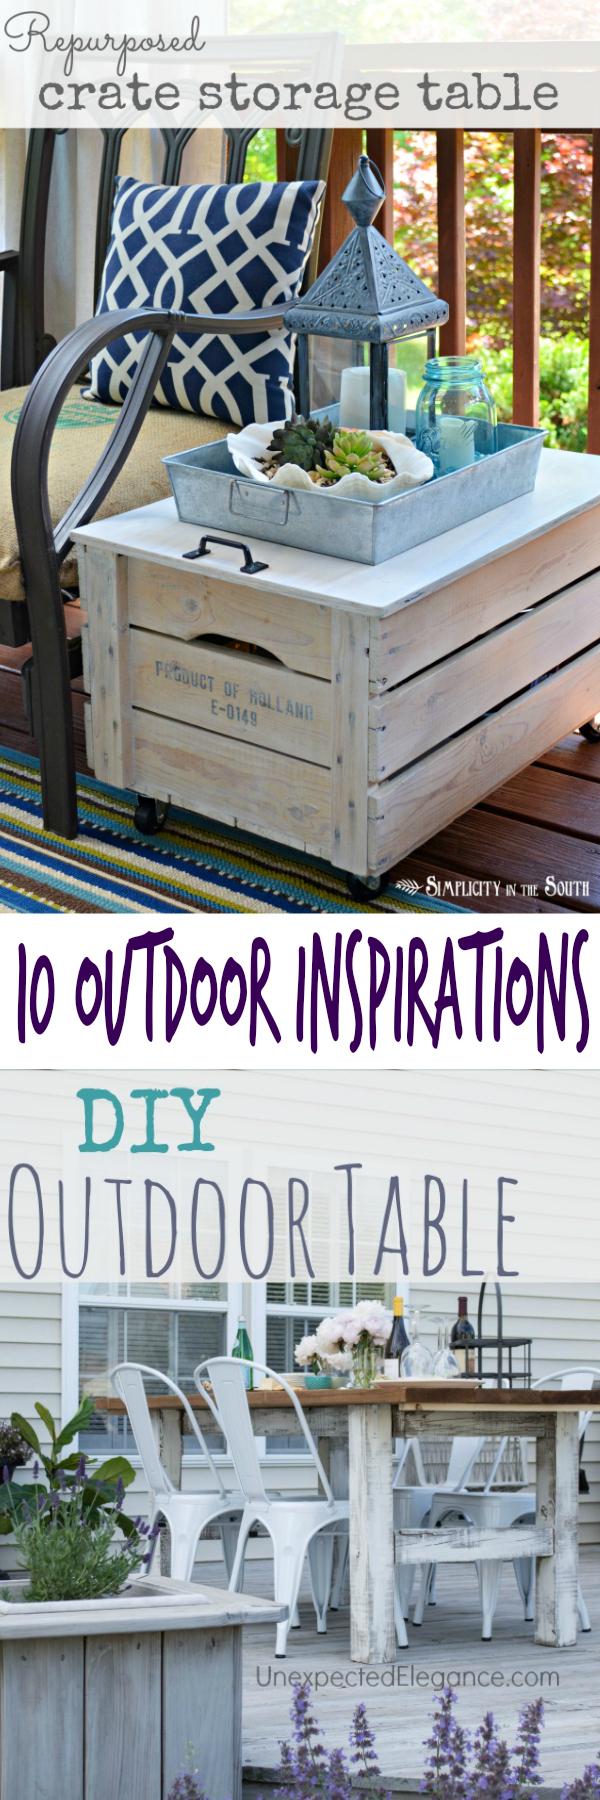 10 Outdoor Inspirations